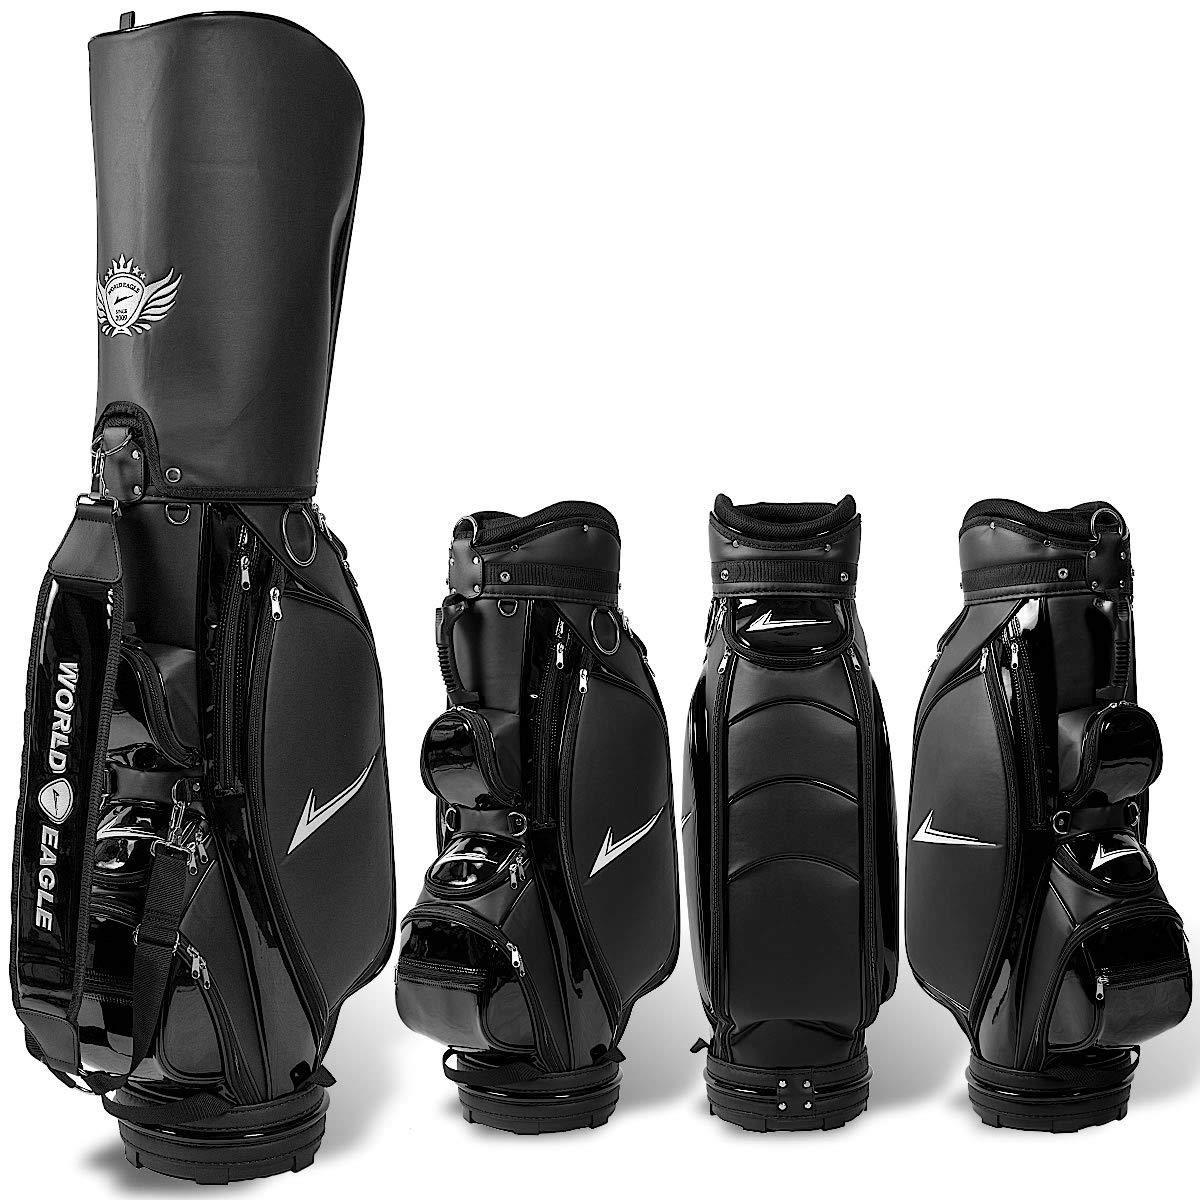 WORLD EAGLE(ワールドイーグル) CBX001 メンズ B002R025WC ゴルフ カート ゴルフ バッグ メンズ ブラック WE-CBX001 B002R025WC, エアコン専門店 エアコンのマツ:5a629dbf --- kapapa.site